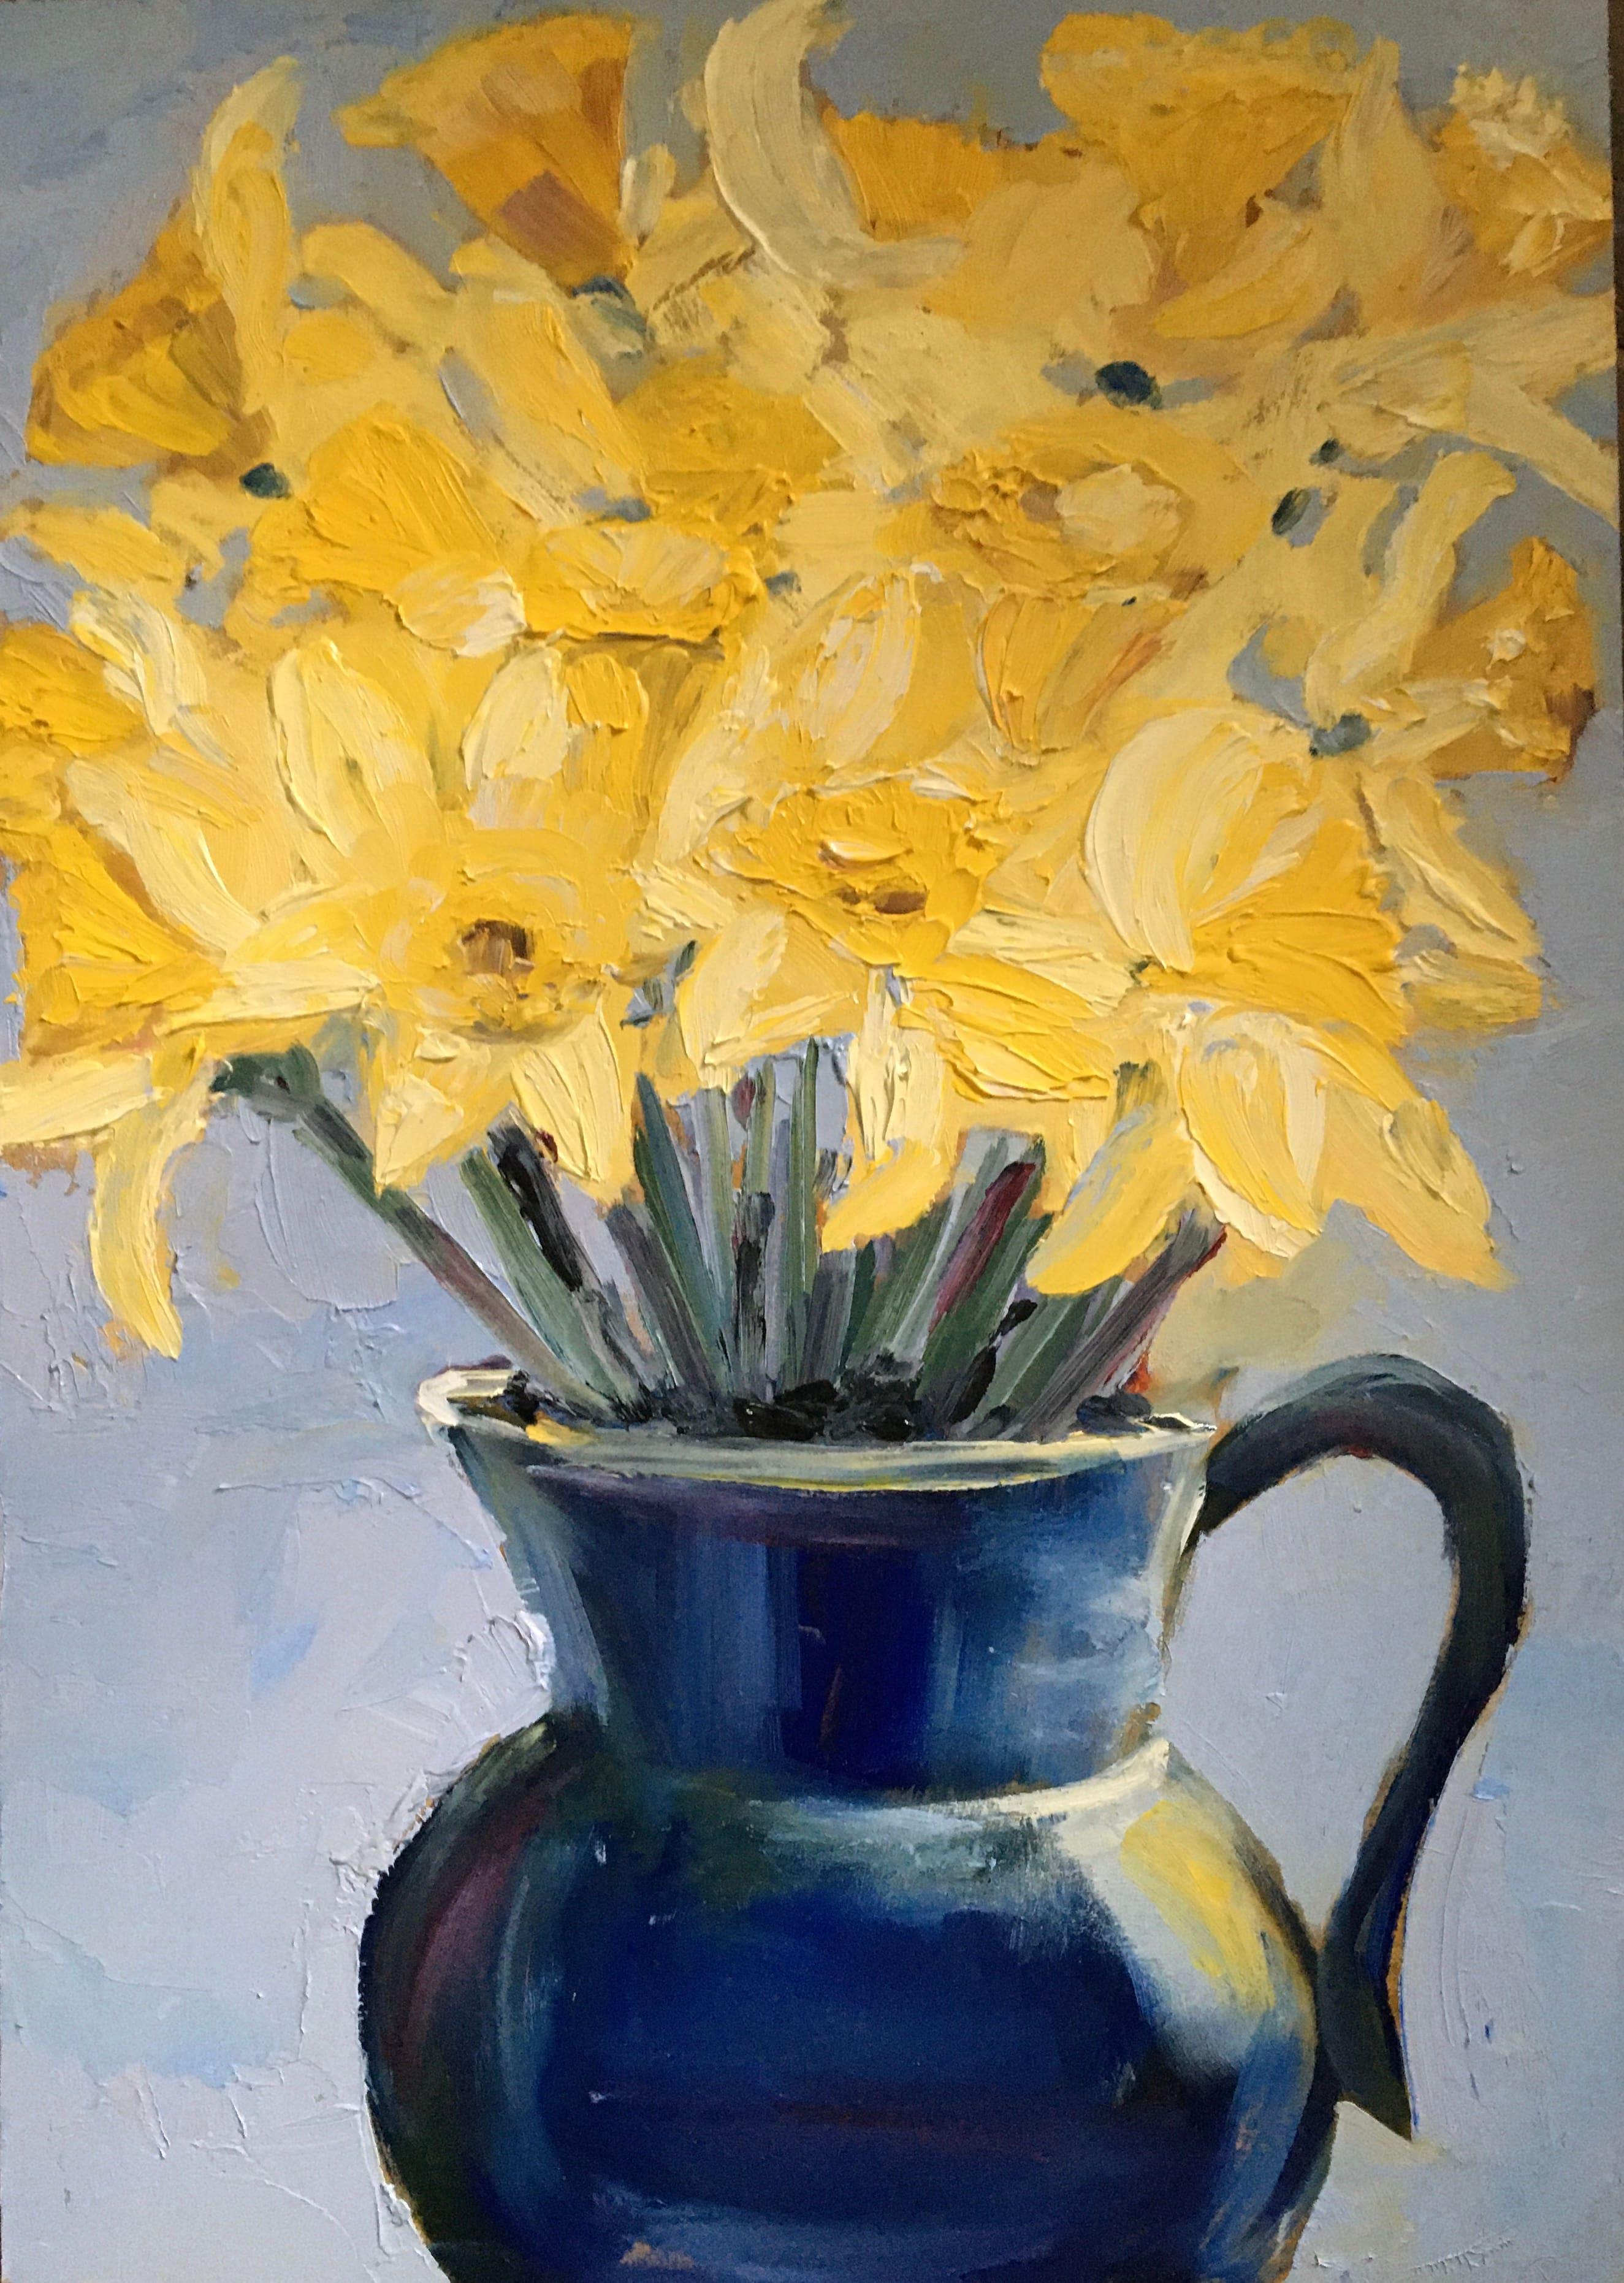 daffodils oil painting blue jug impasto paint